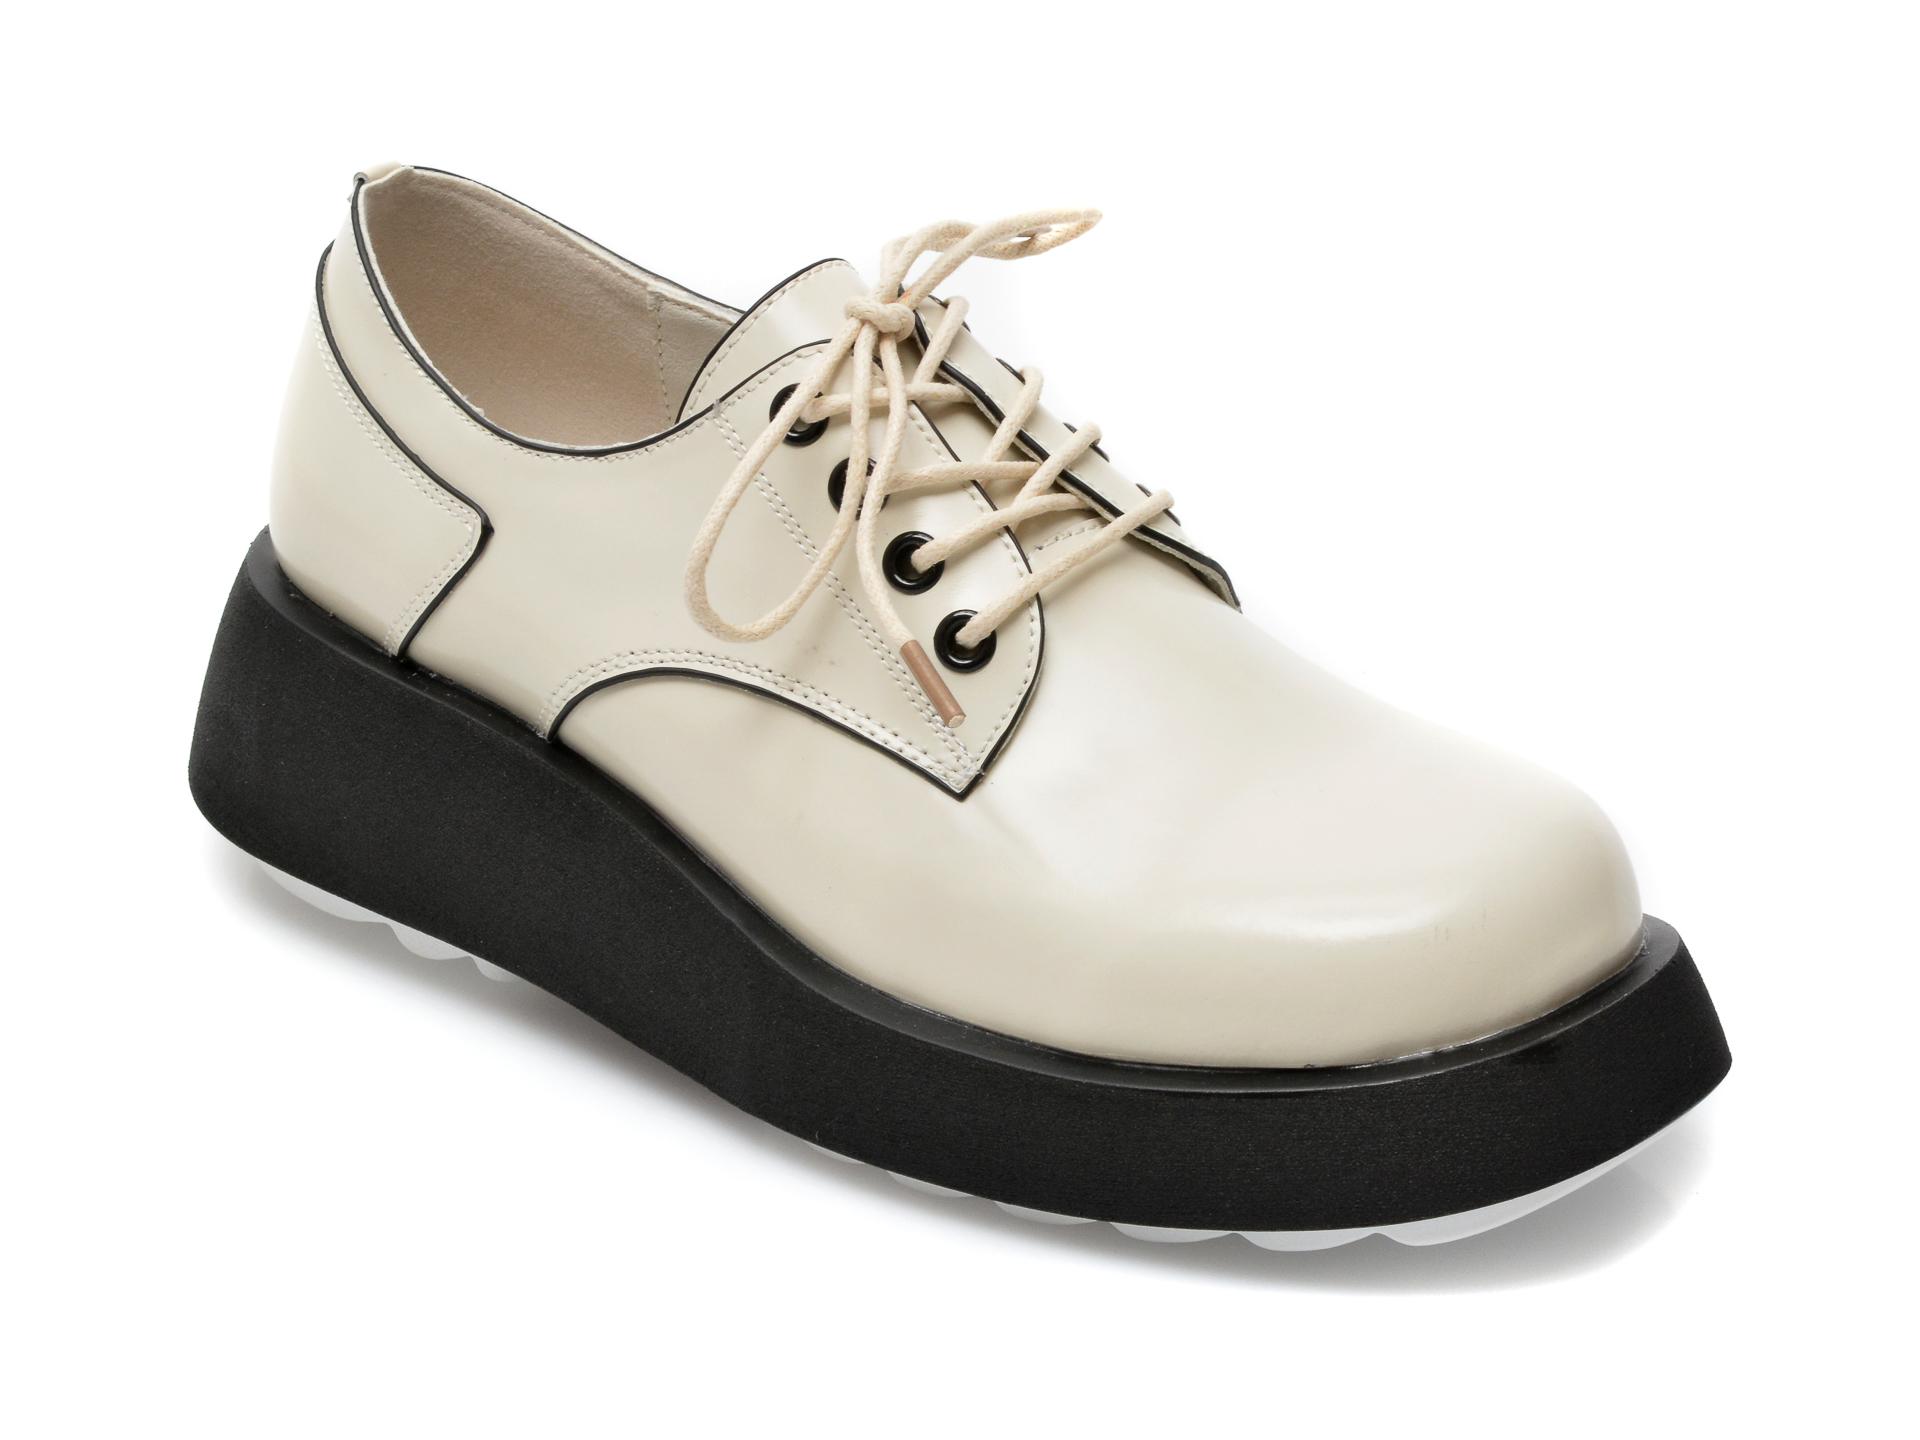 Pantofi GRYXX albi, Z021, din piele naturala imagine otter.ro 2021